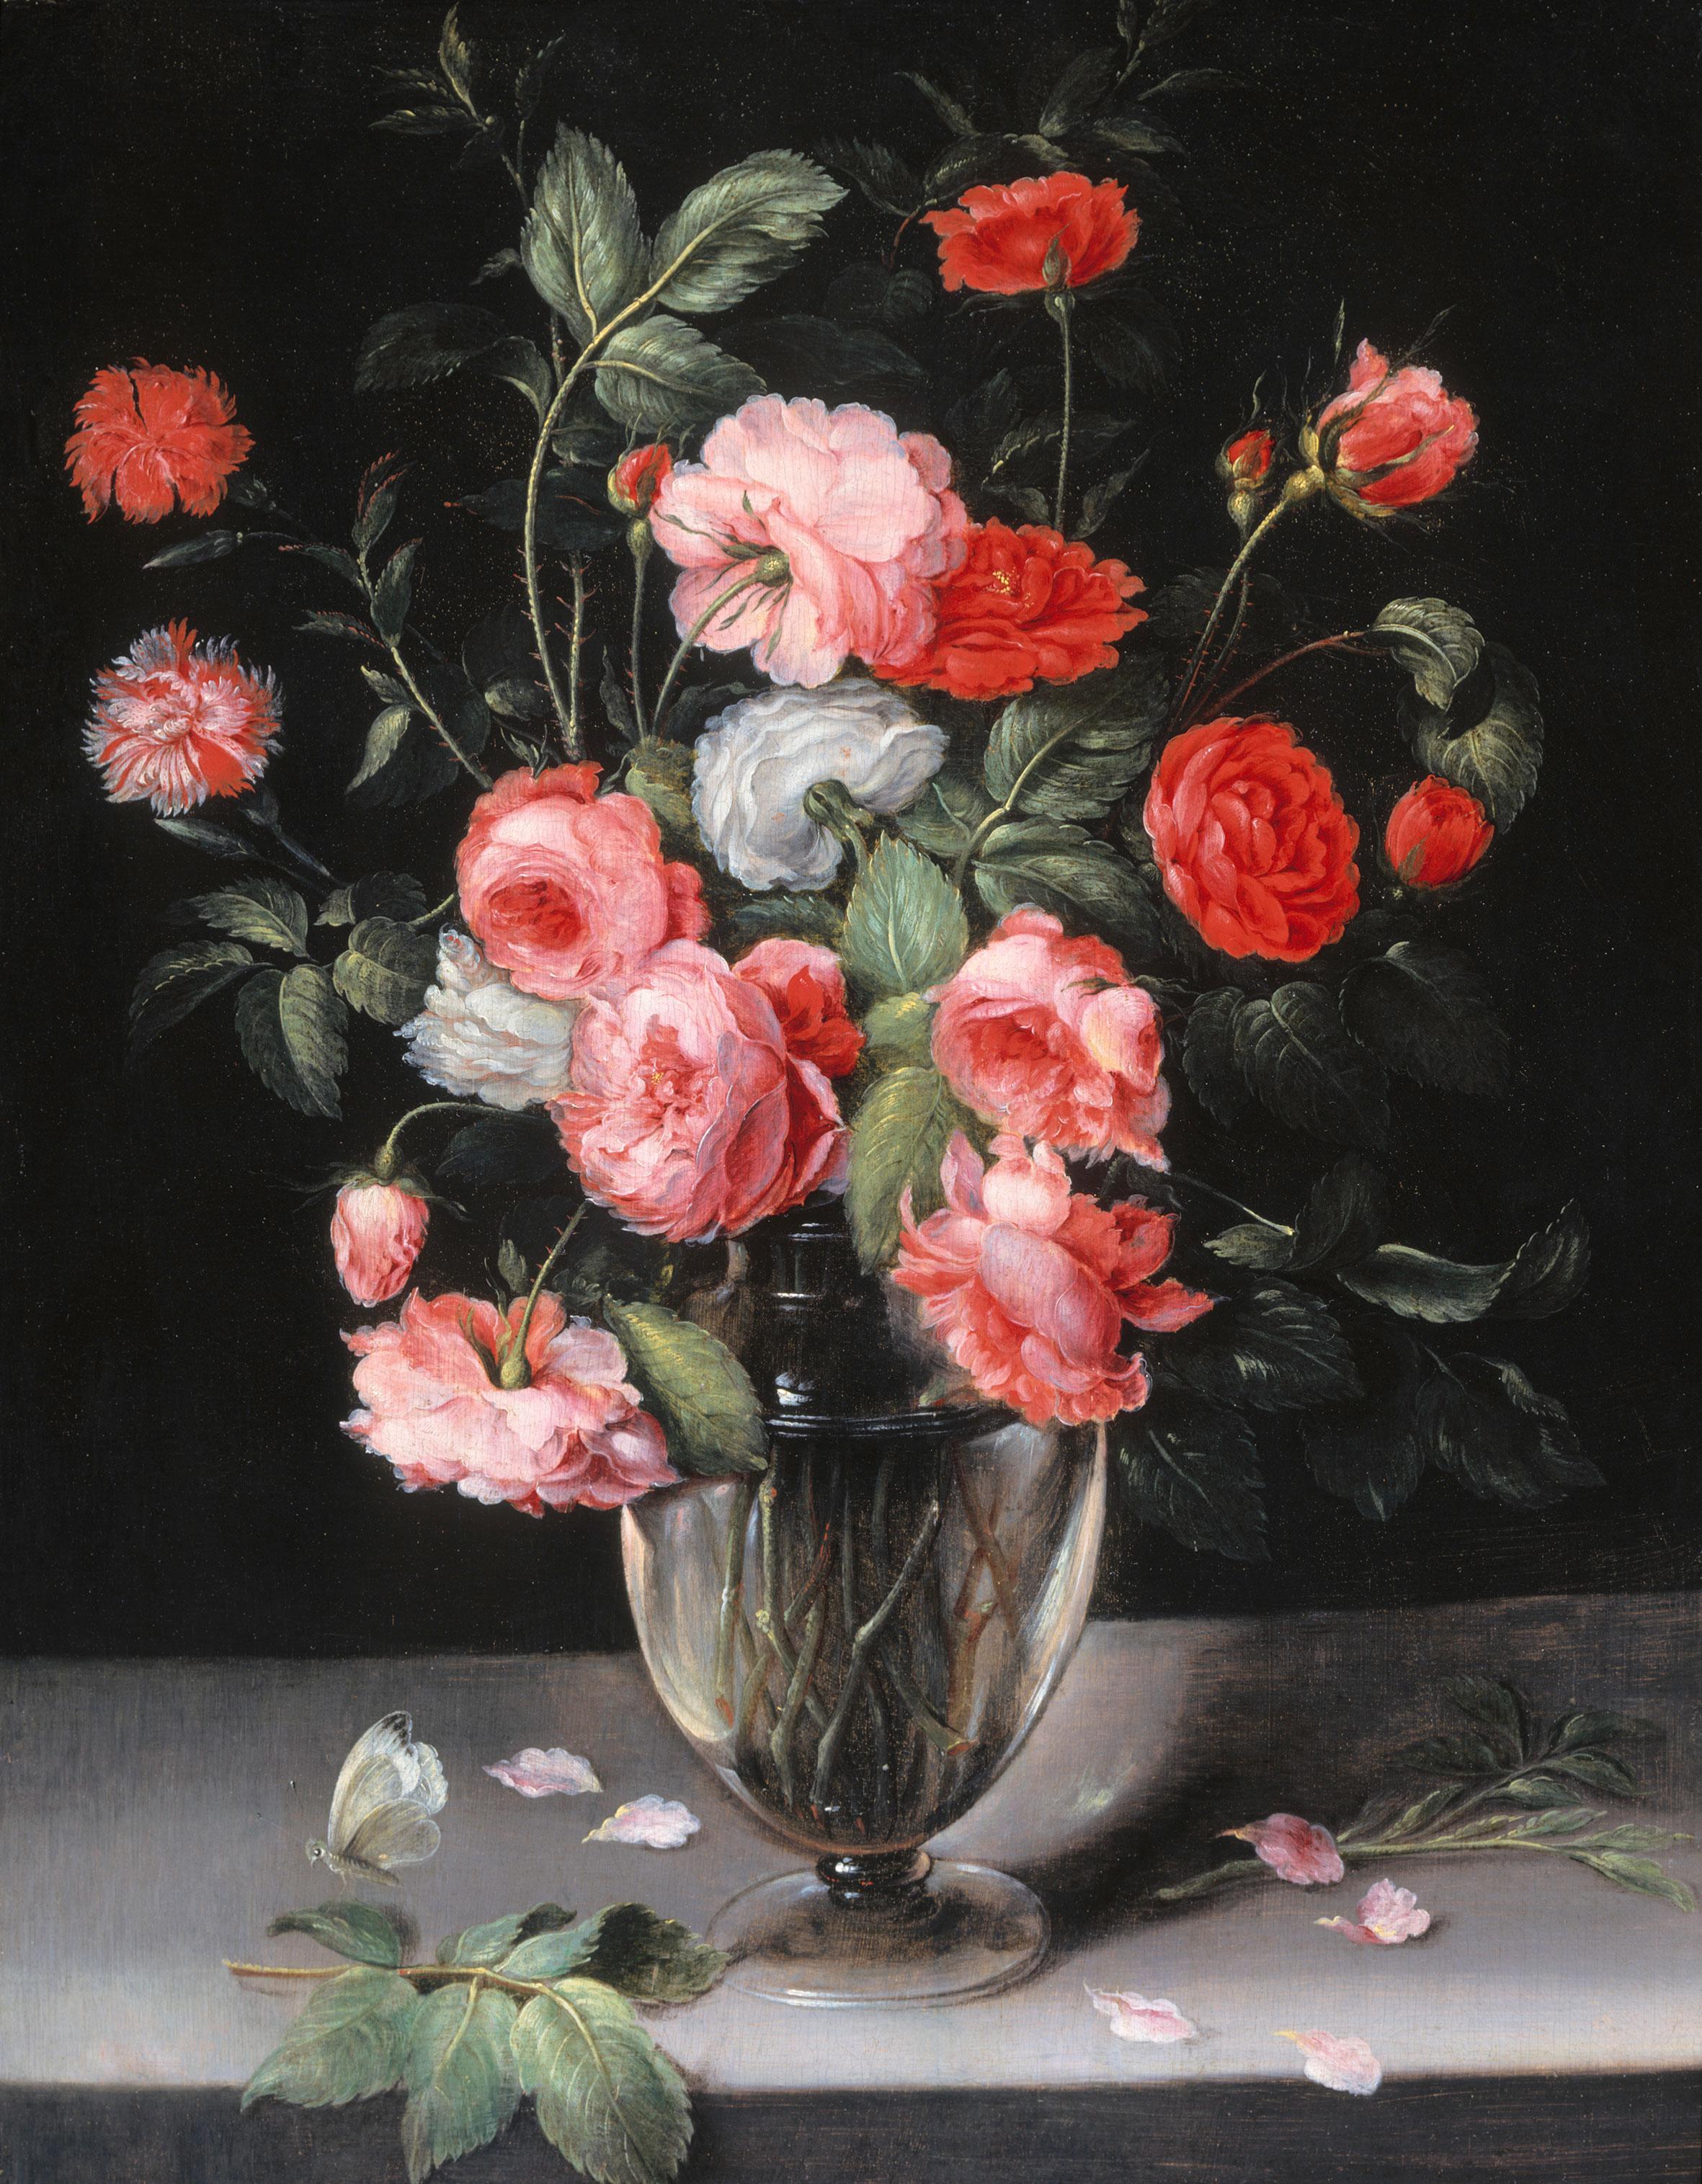 https://upload.wikimedia.org/wikipedia/commons/9/90/Alexander_Adriaenssen_-_Still_Life_with_Flowers_in_a_Glass_Vase.jpg